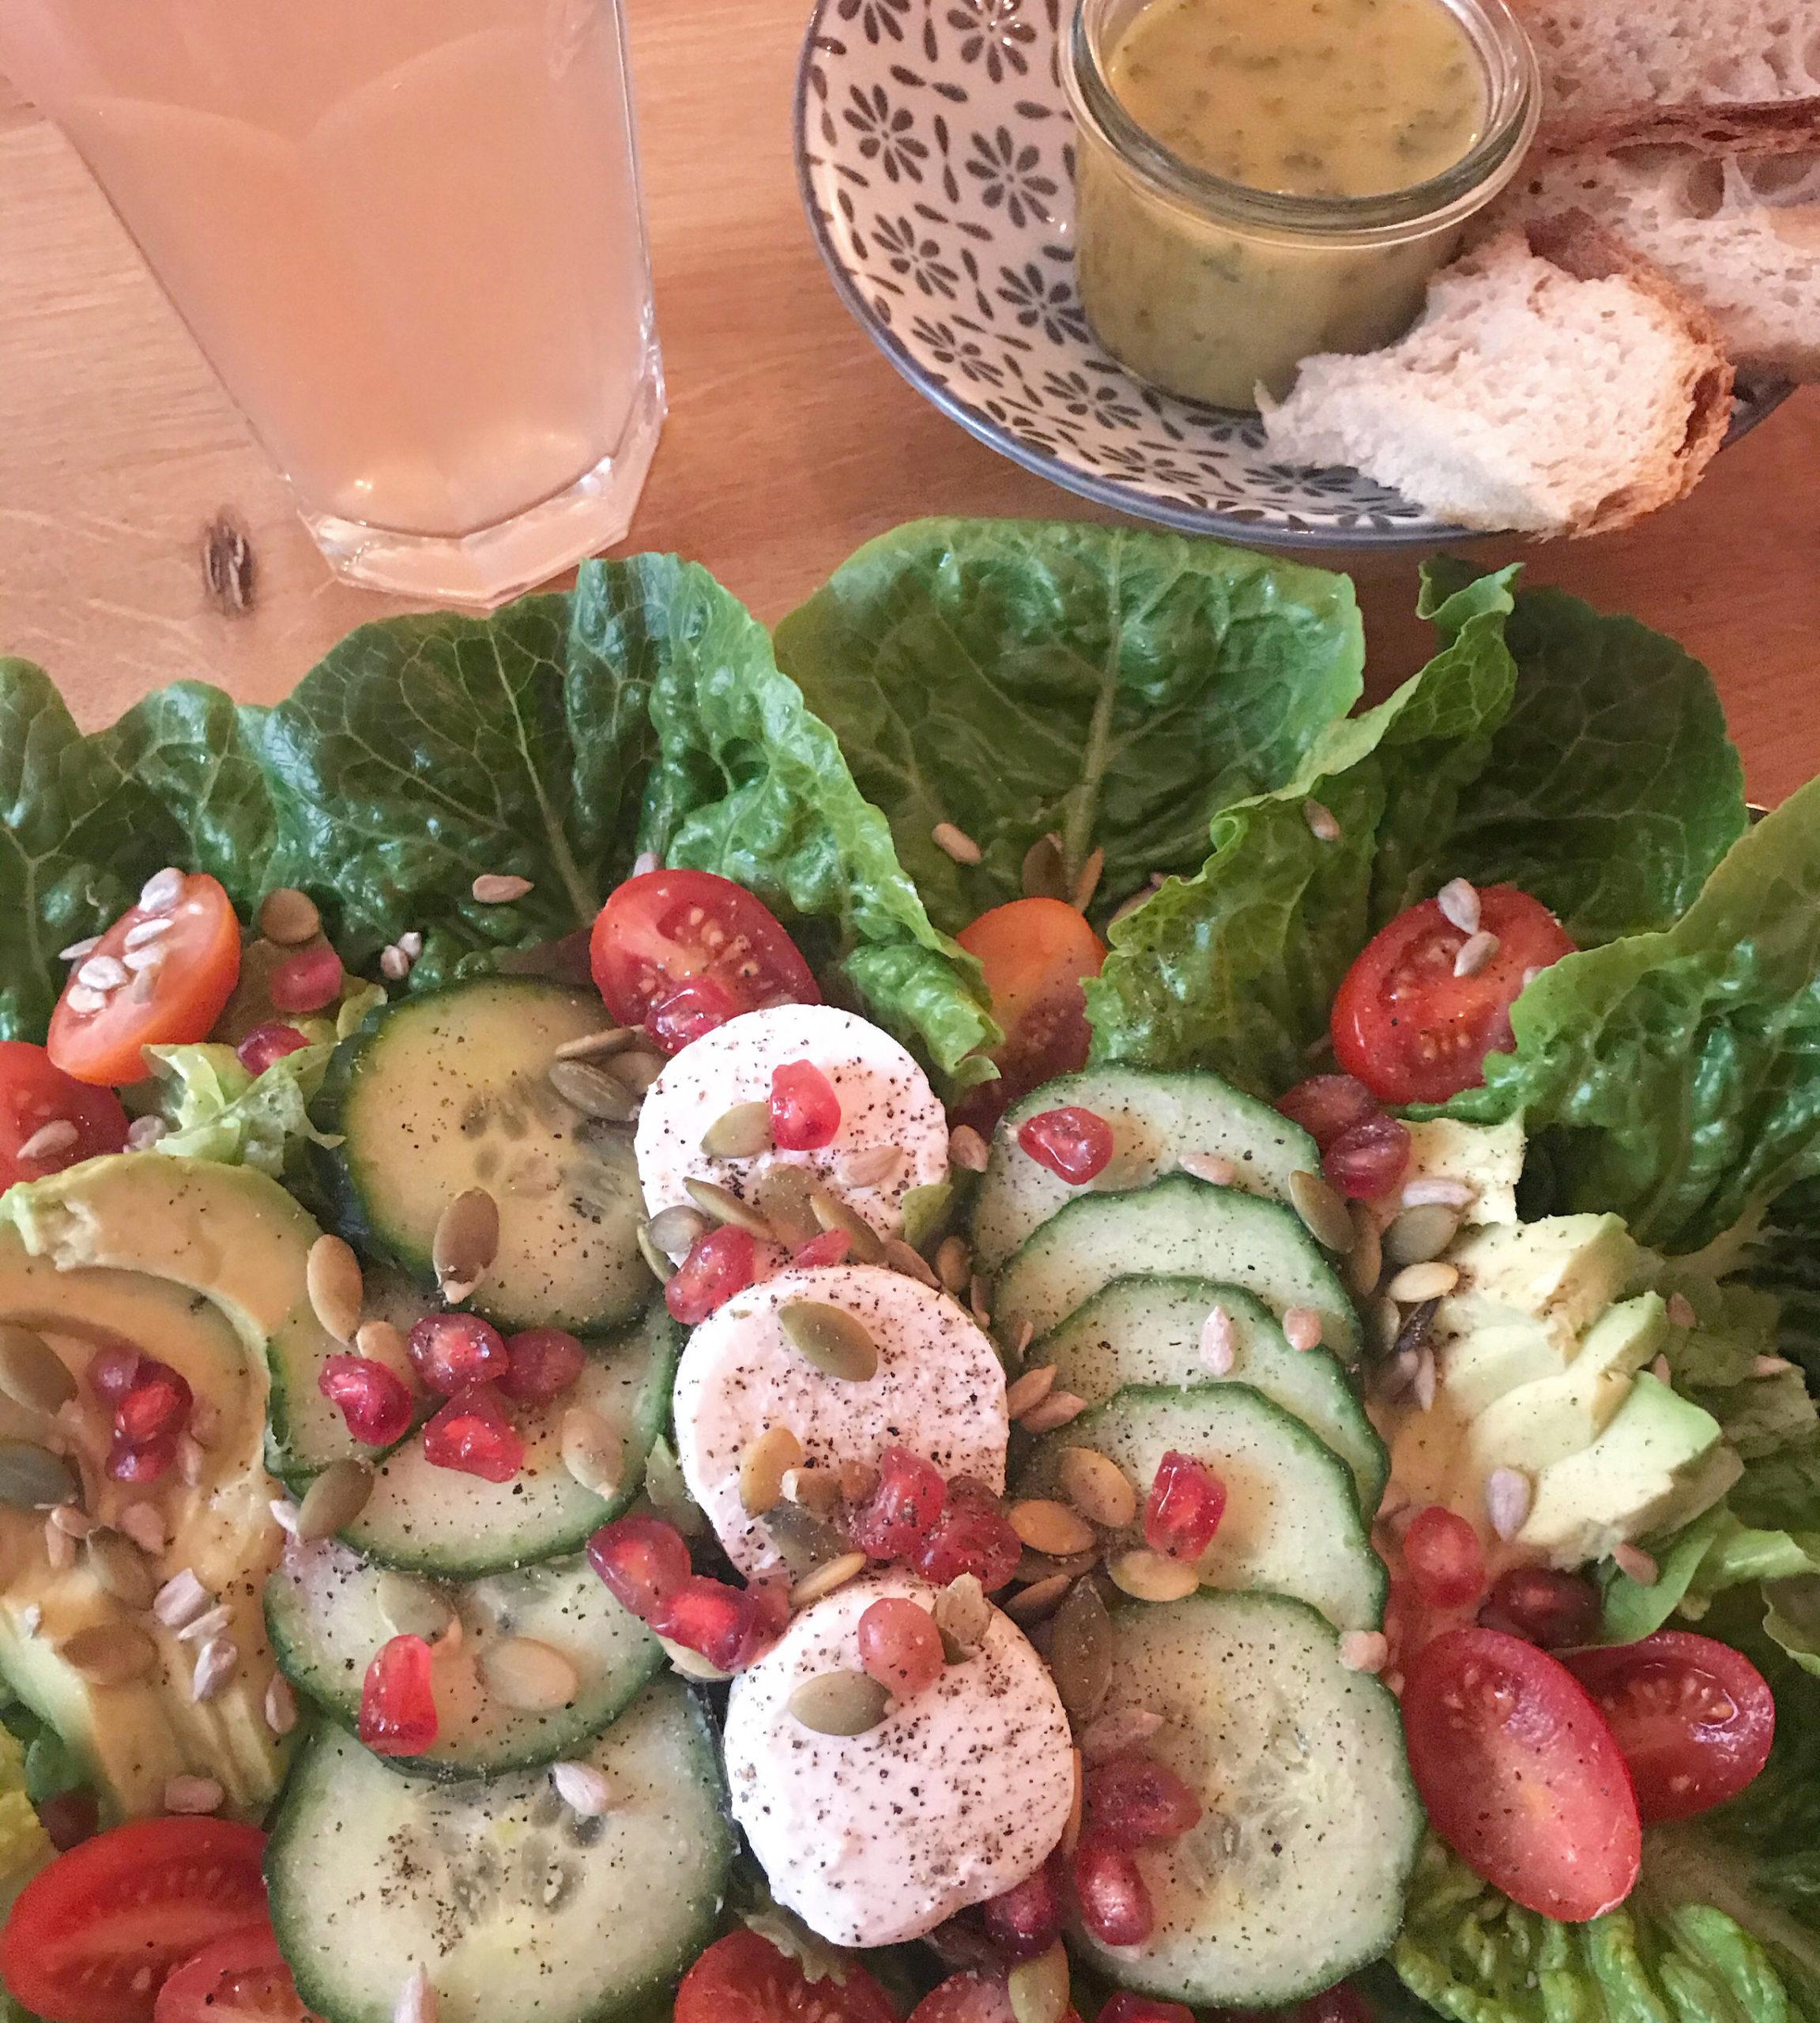 Salat in Stuttgart